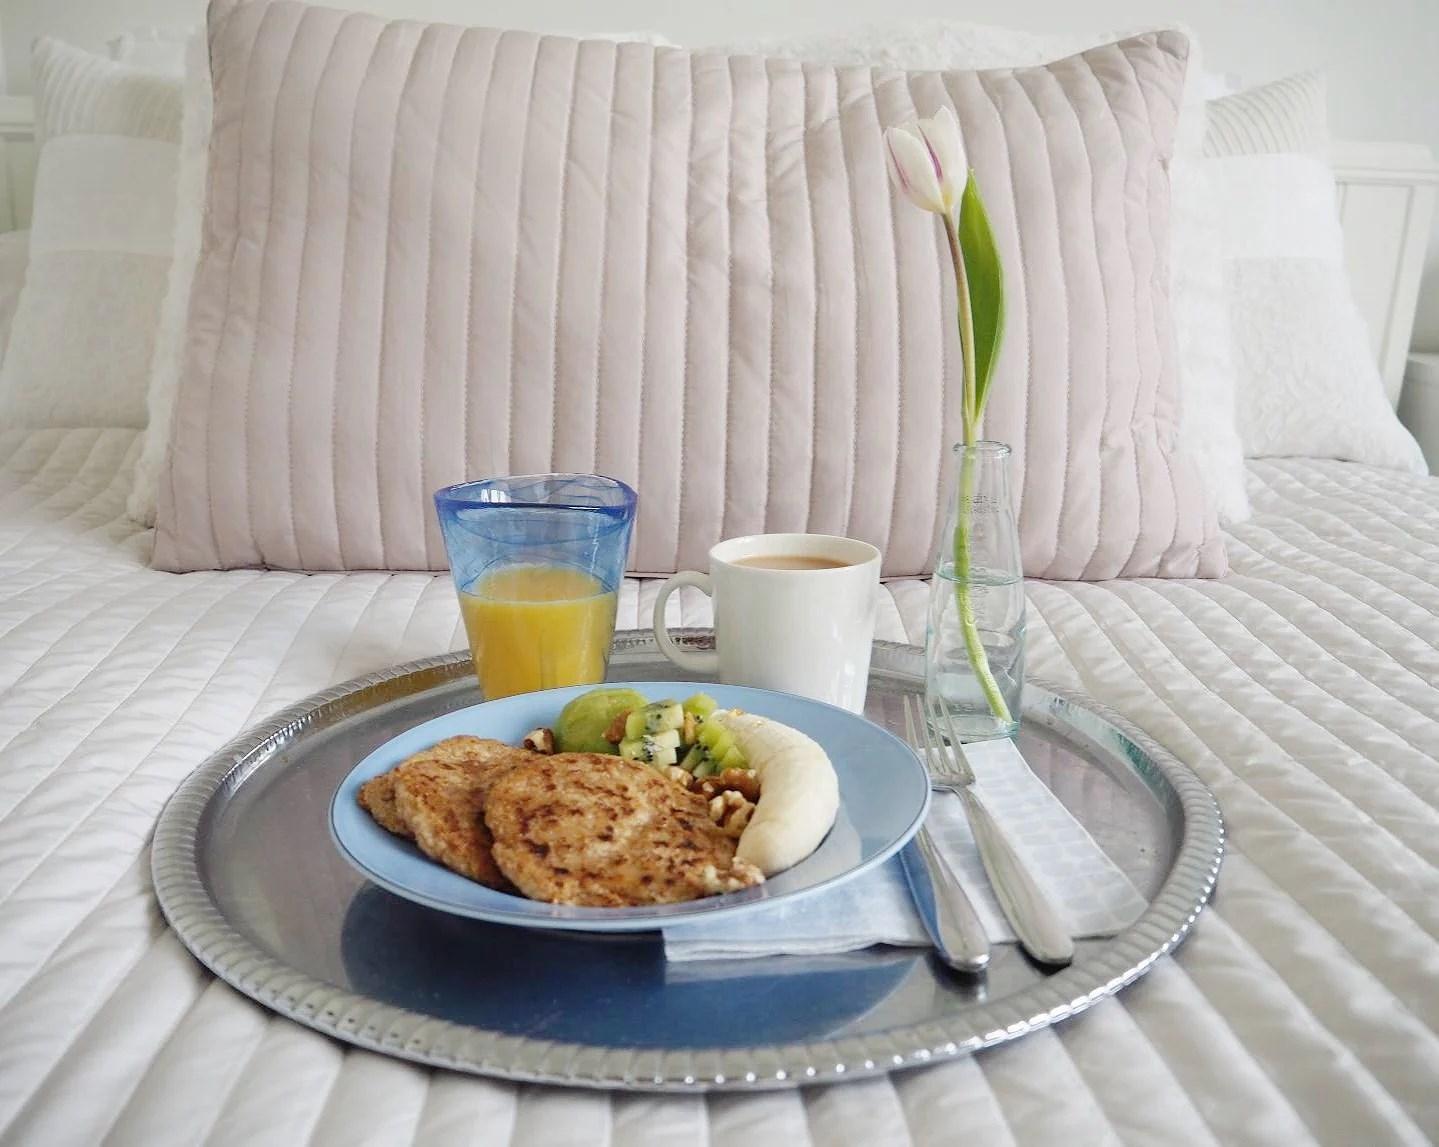 vegansk frukost - stek havregrynsgröten